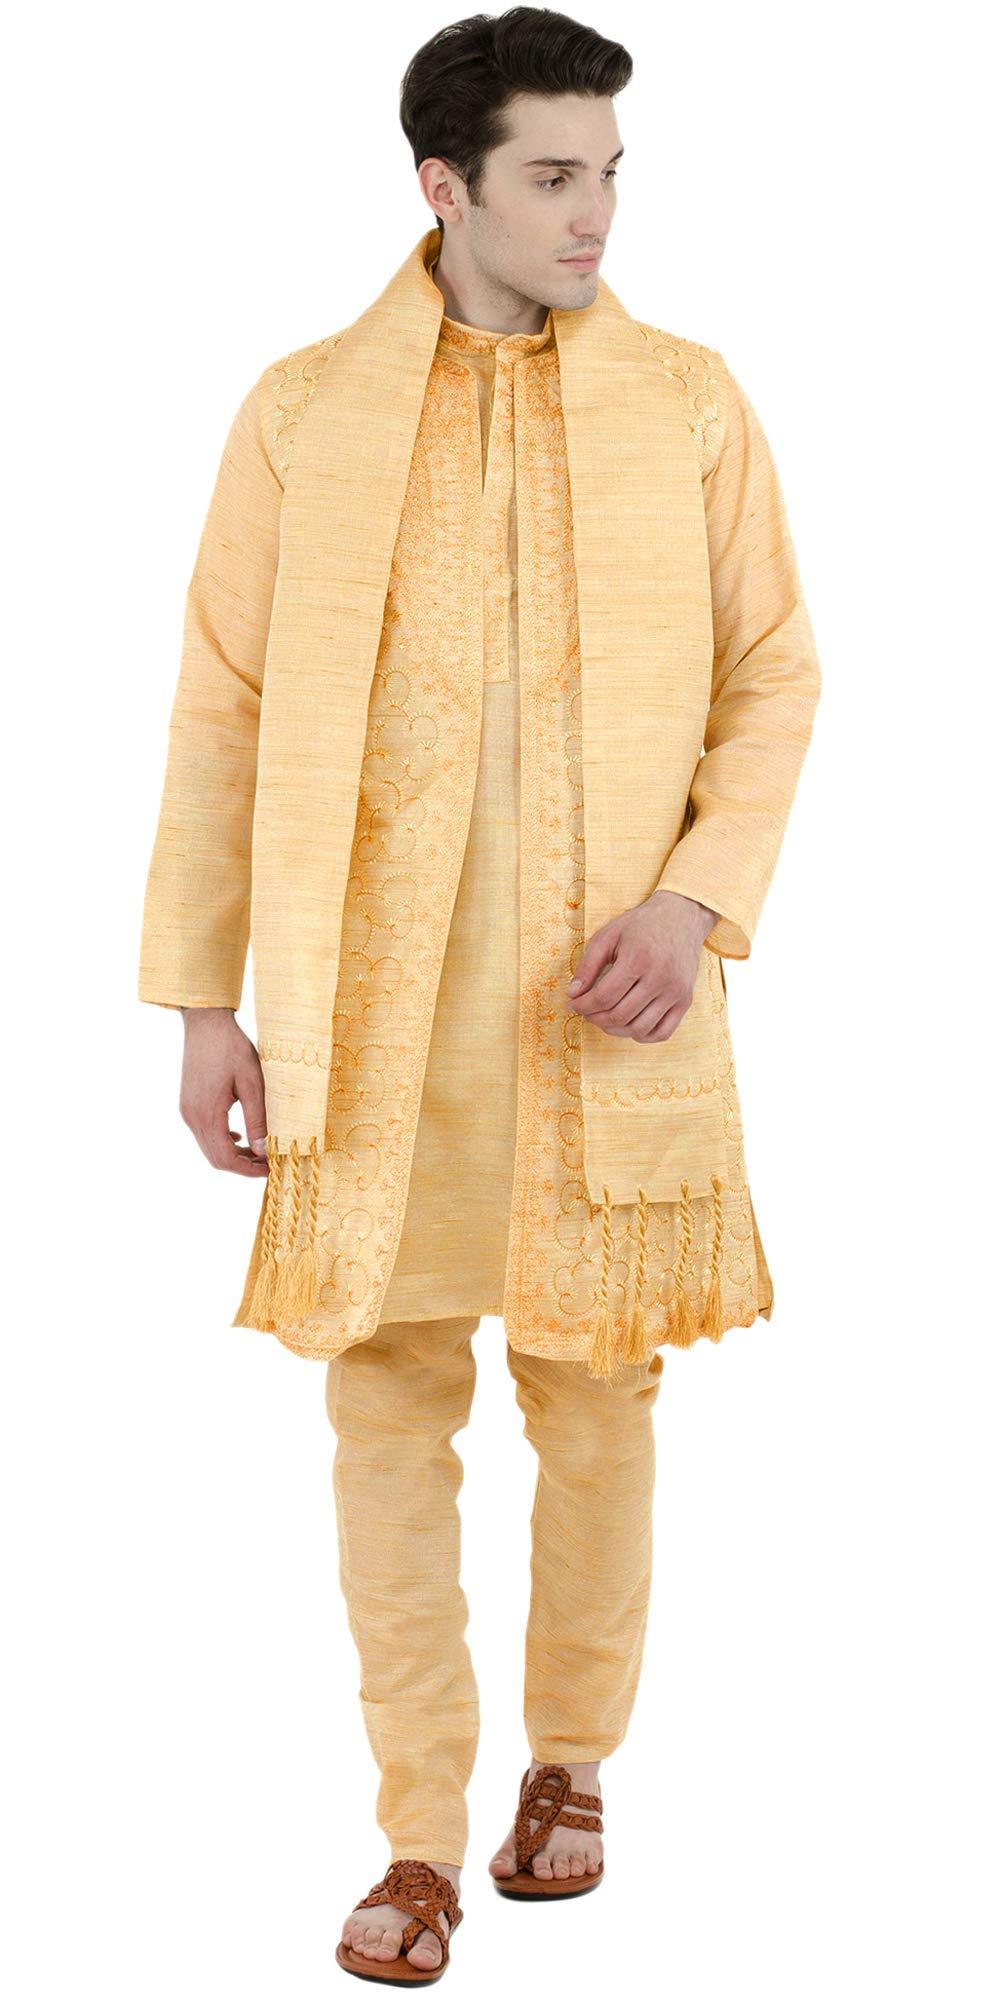 Wedding Kurta Pajama 4-Pieces Set Mens Party Wear Casual Long Sleeve Button Down Shirt Dress -L Gold